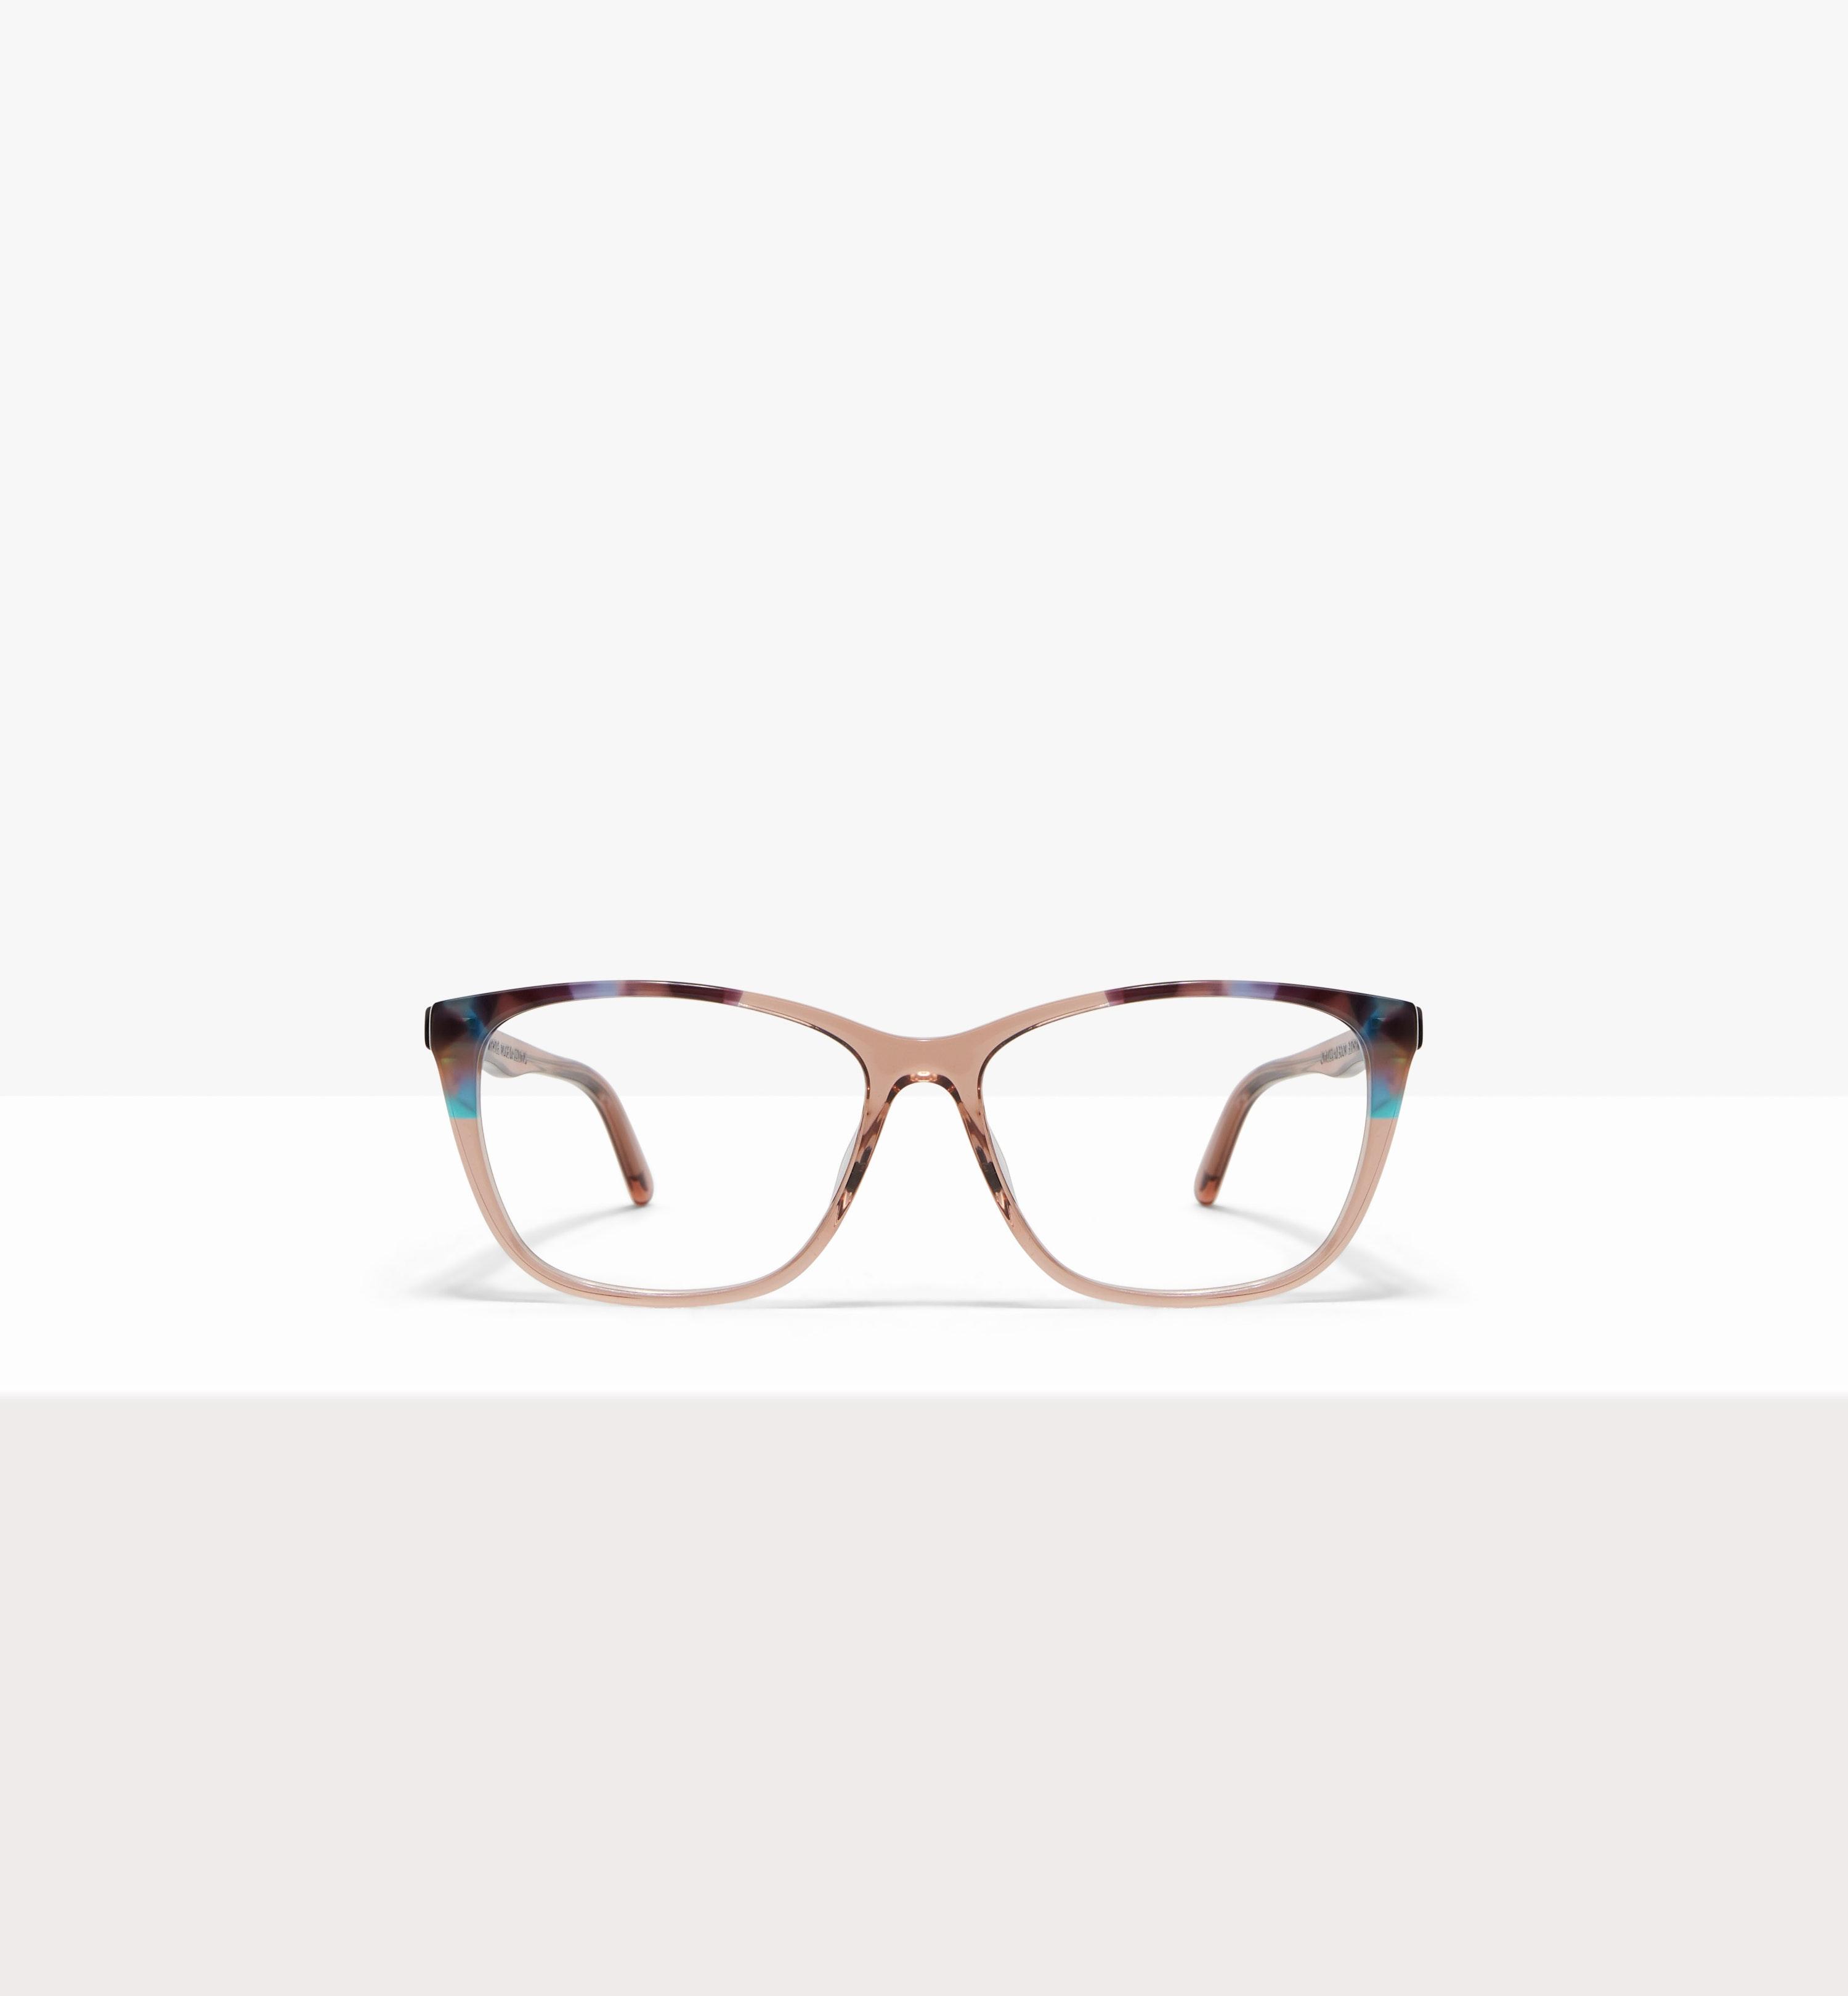 Affordable Fashion Glasses Cat Eye Rectangle Eyeglasses Women Myrtle Rose Dazzling Front